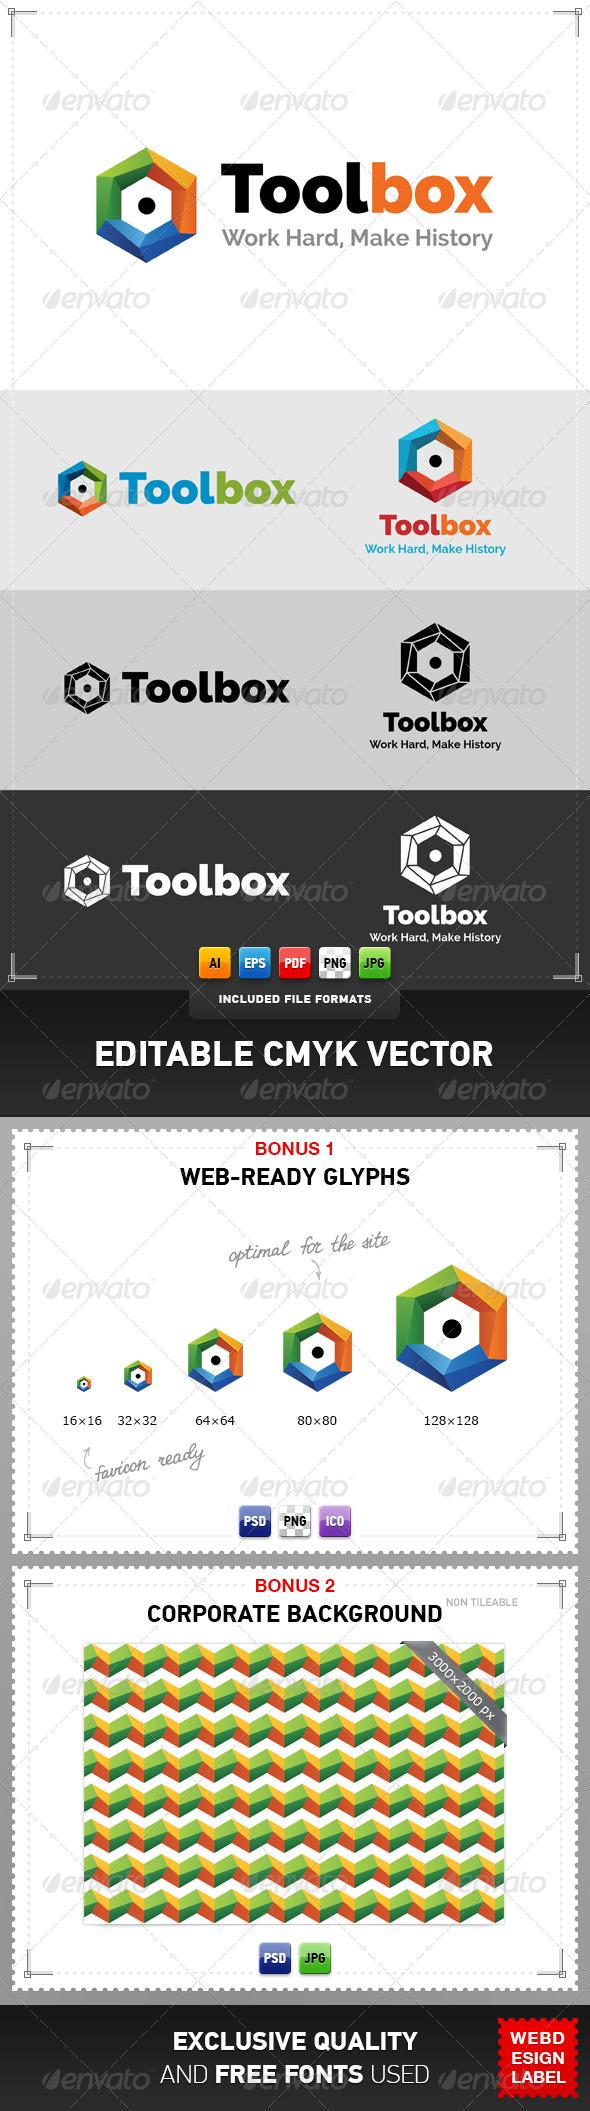 GraphicRiver Toolbox Logo 4769395